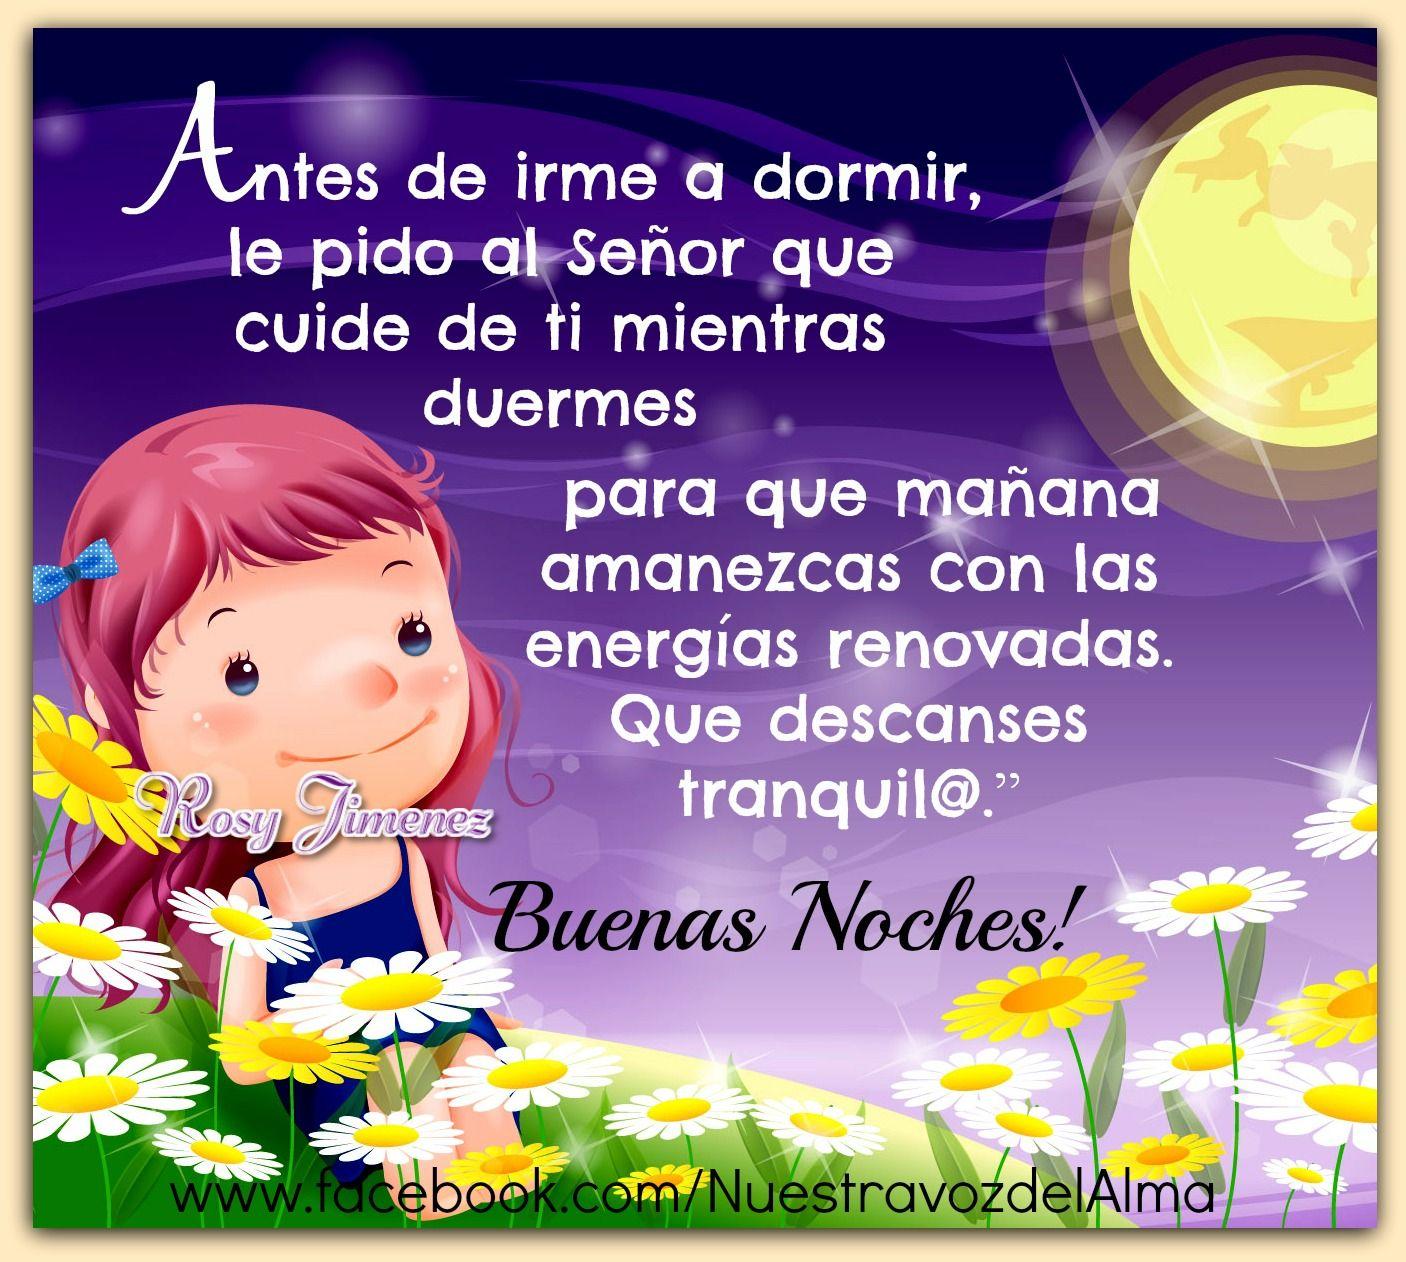 Nuestra Voz Del Alma Good Night Quotes Night Messages Good Night Moon